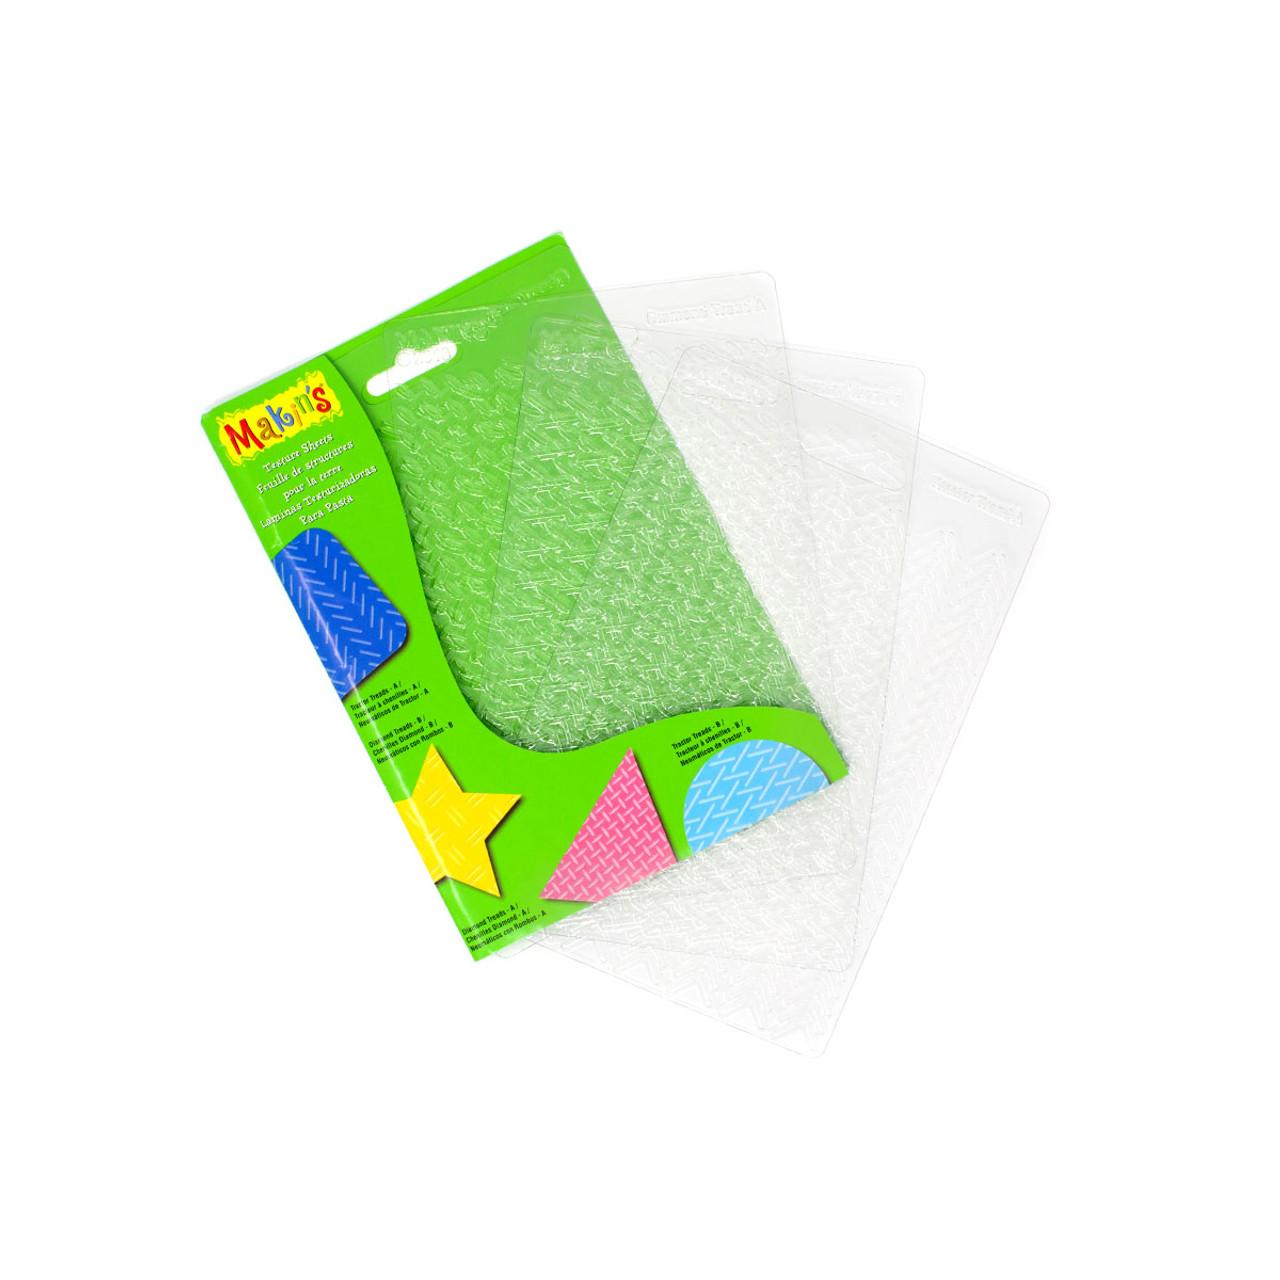 Makin's Clay Texture Sheets - Set G